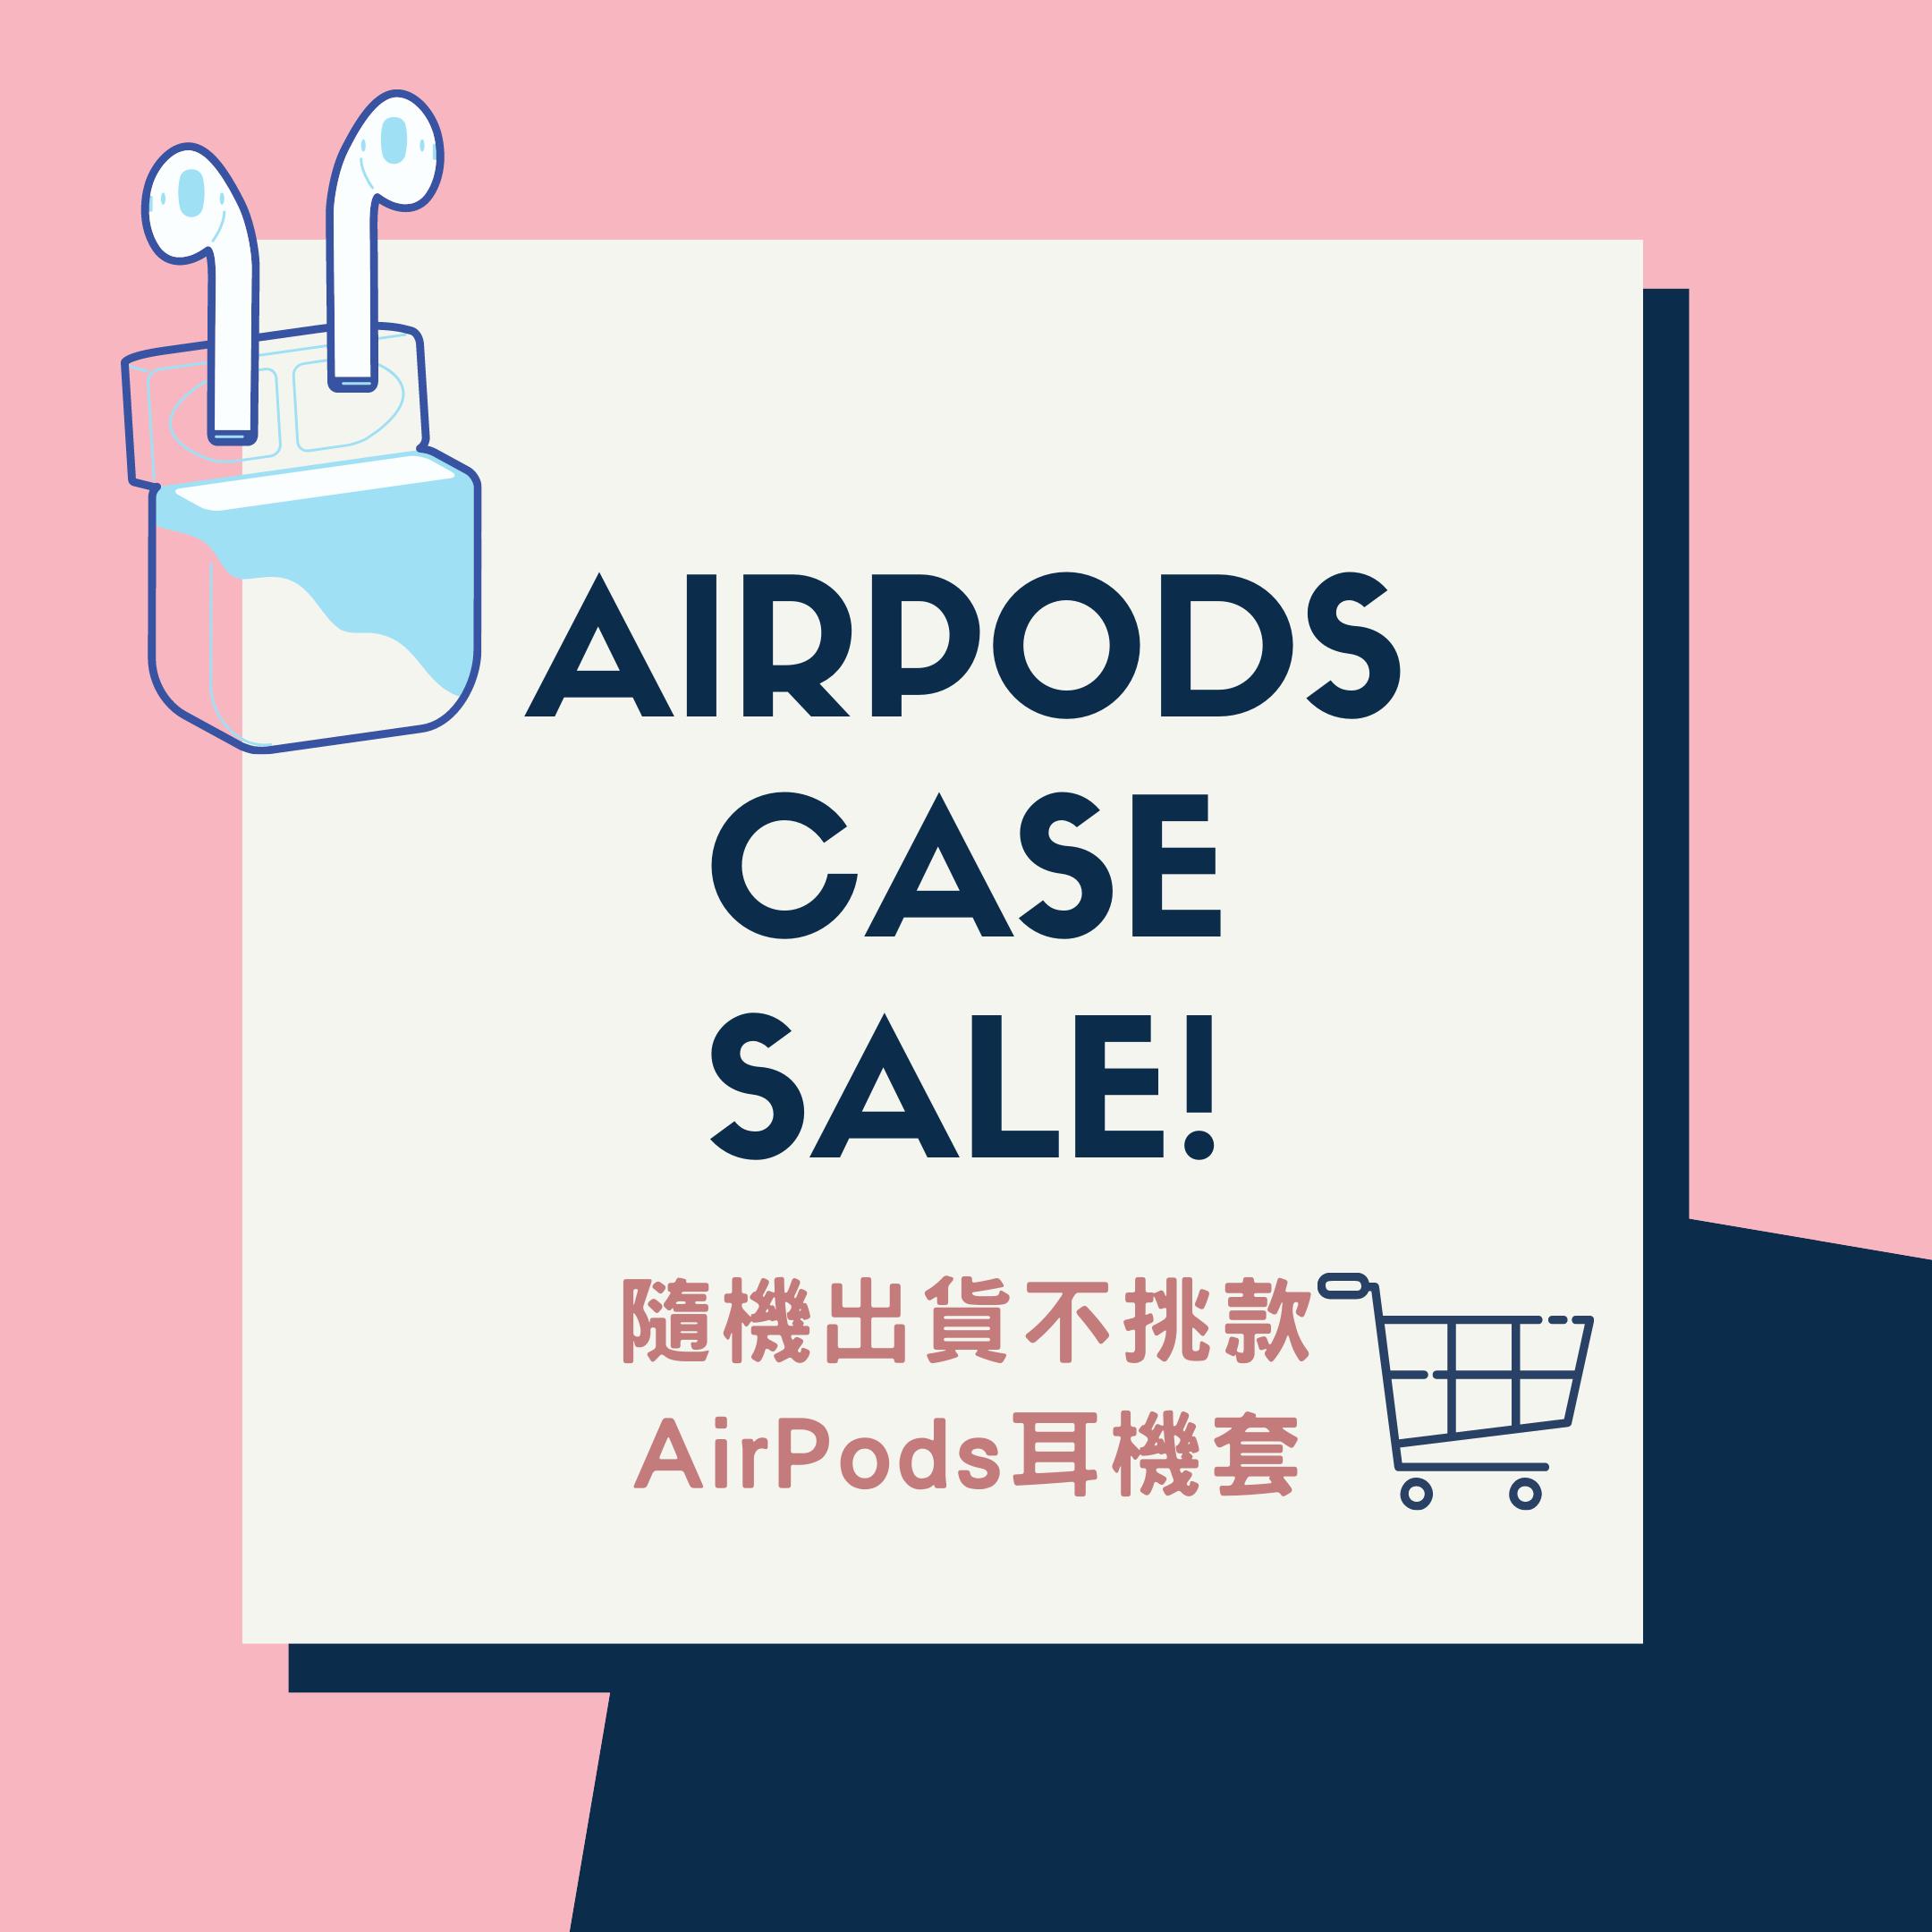 Airpods套子-隨機出貨一個79元.售完為止 經典卡通款 簡約款 Airpods套子 Unicorn手機殼